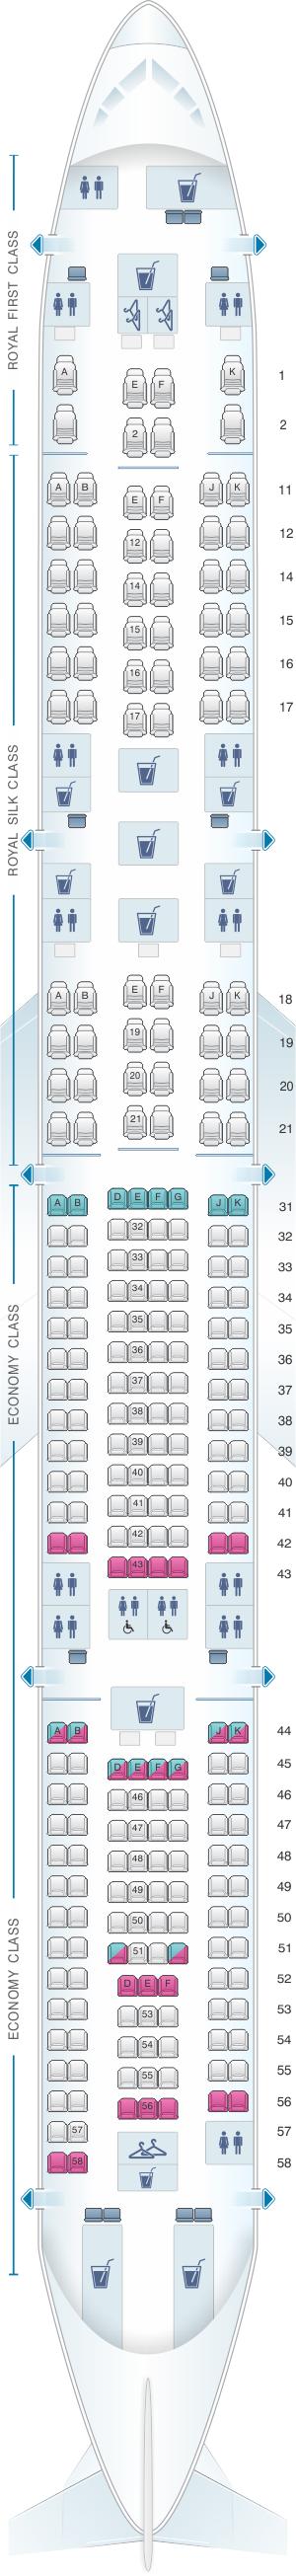 Seat map for Thai Airways International Airbus A340 600